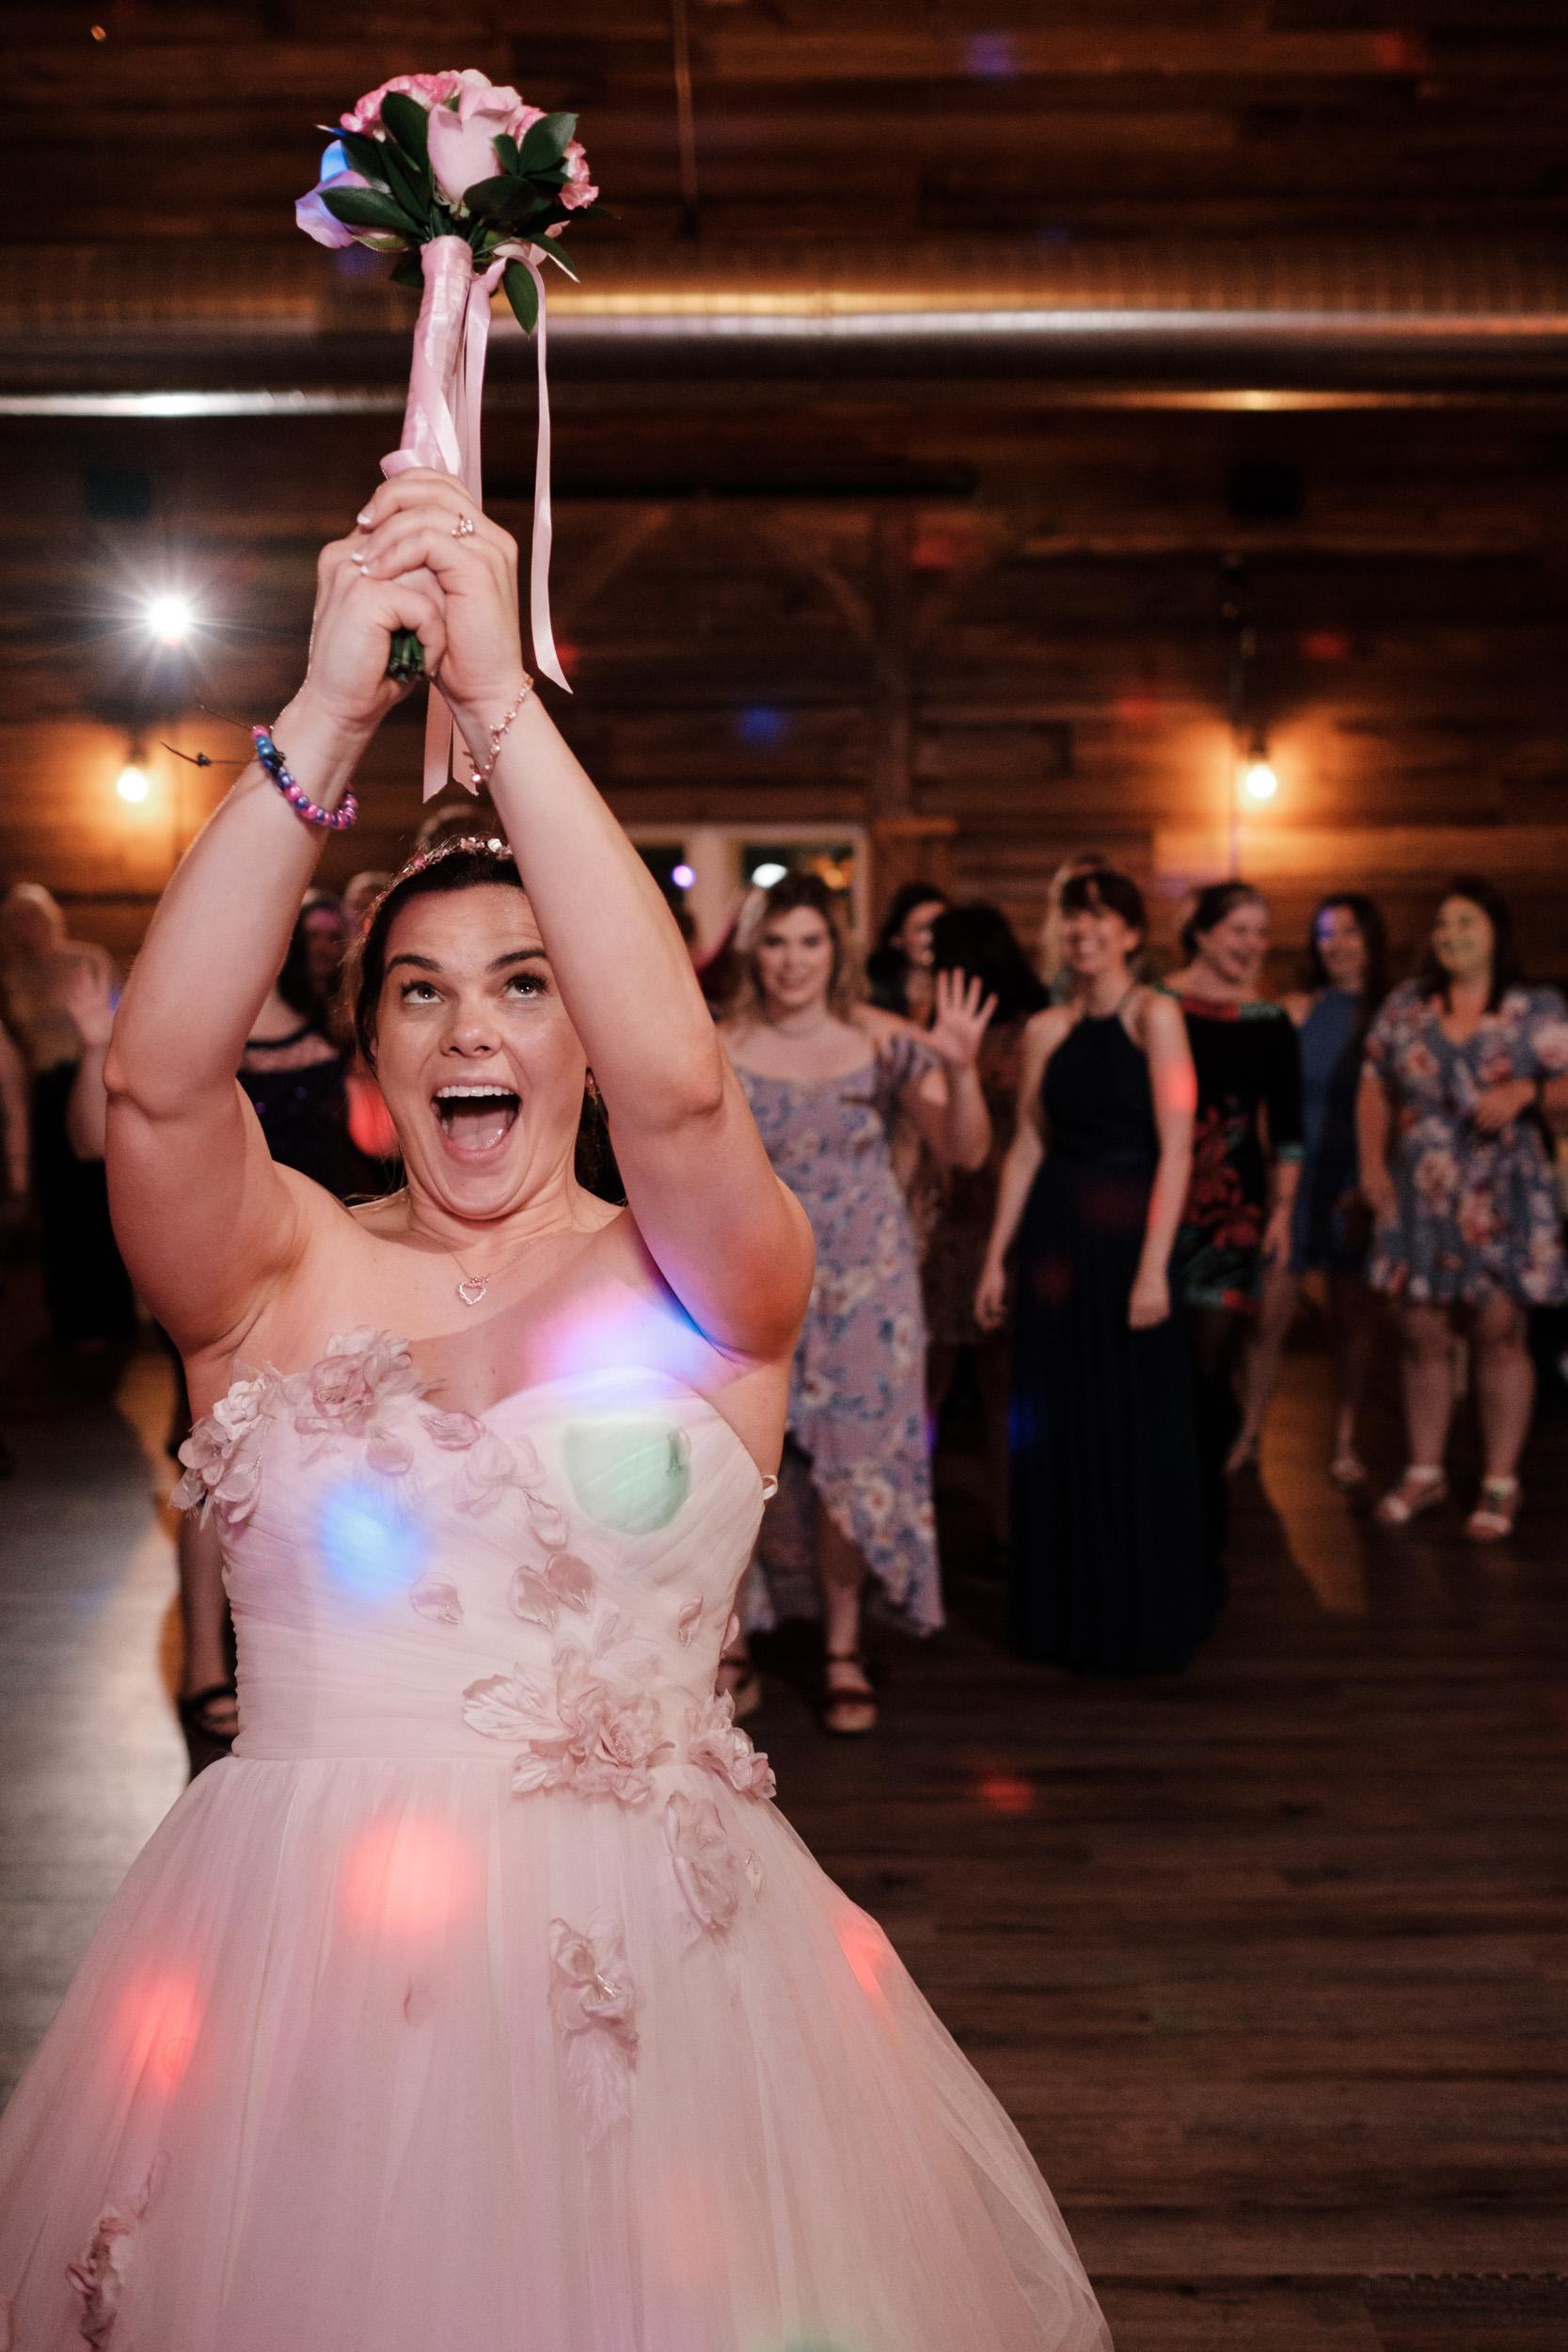 19-06-22-Ryan-Katie-The-Fields-Reserve-Wedding-82.jpg